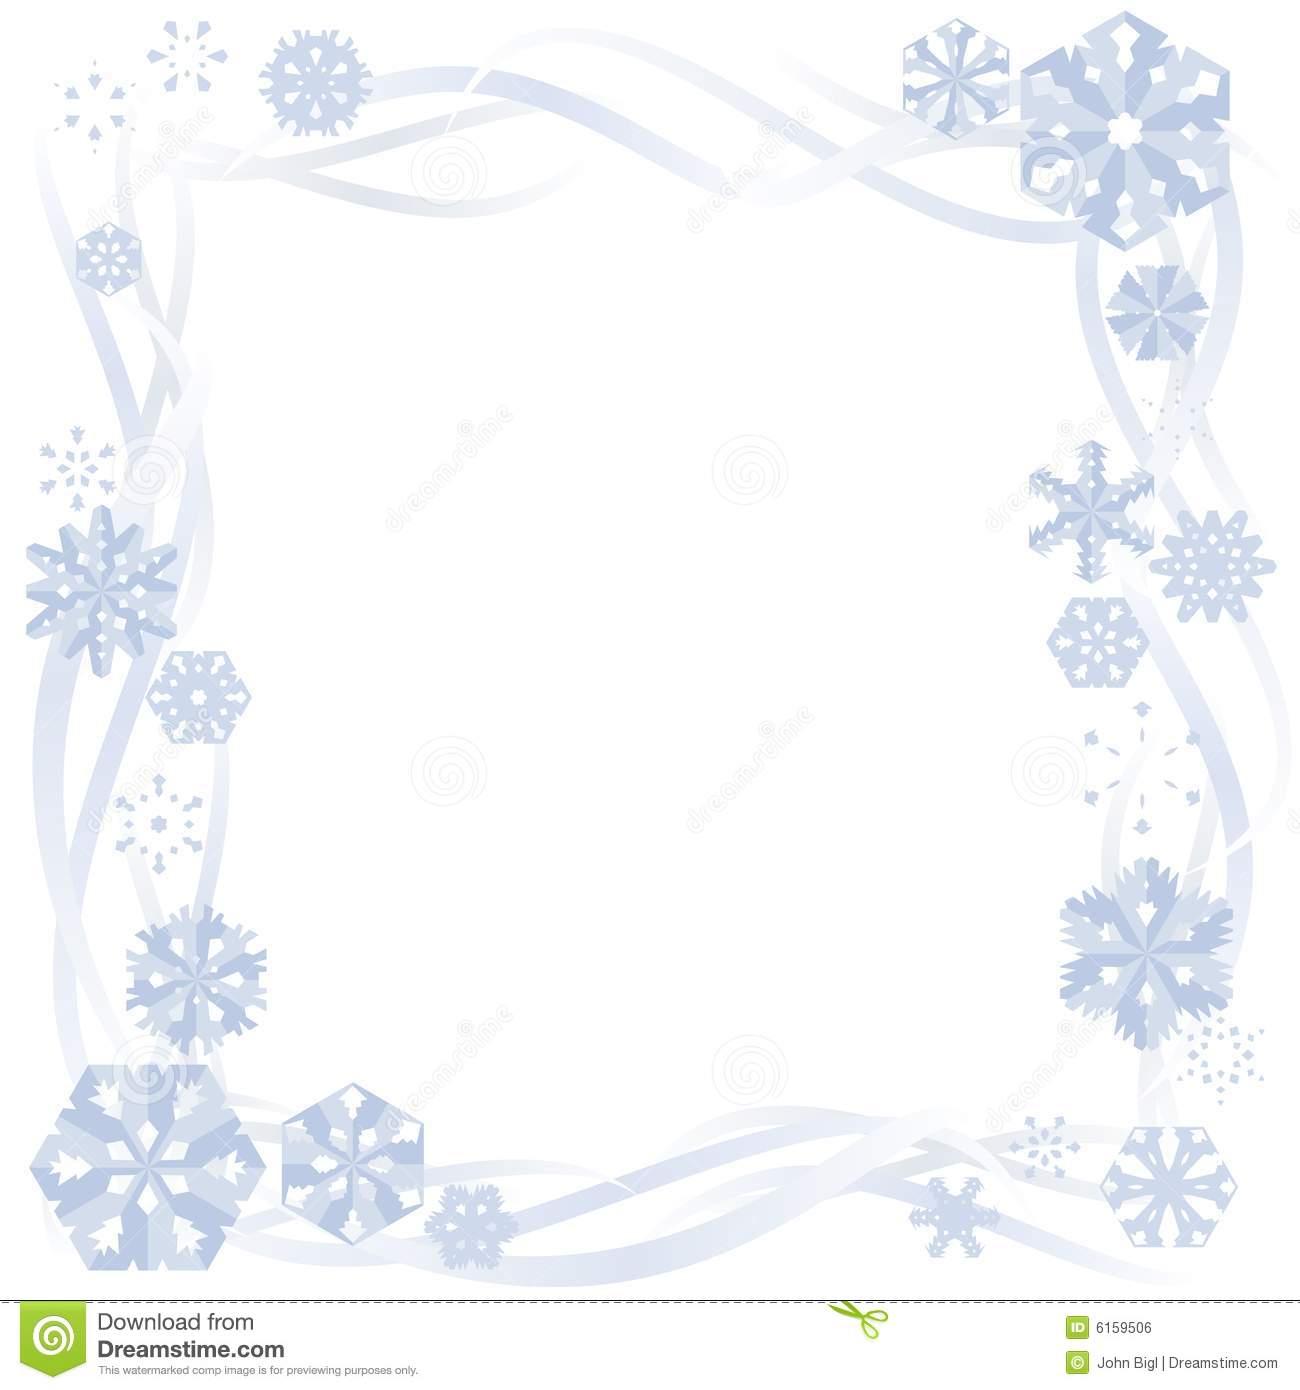 Winter clipart elegant borders Transparent pictures on F.